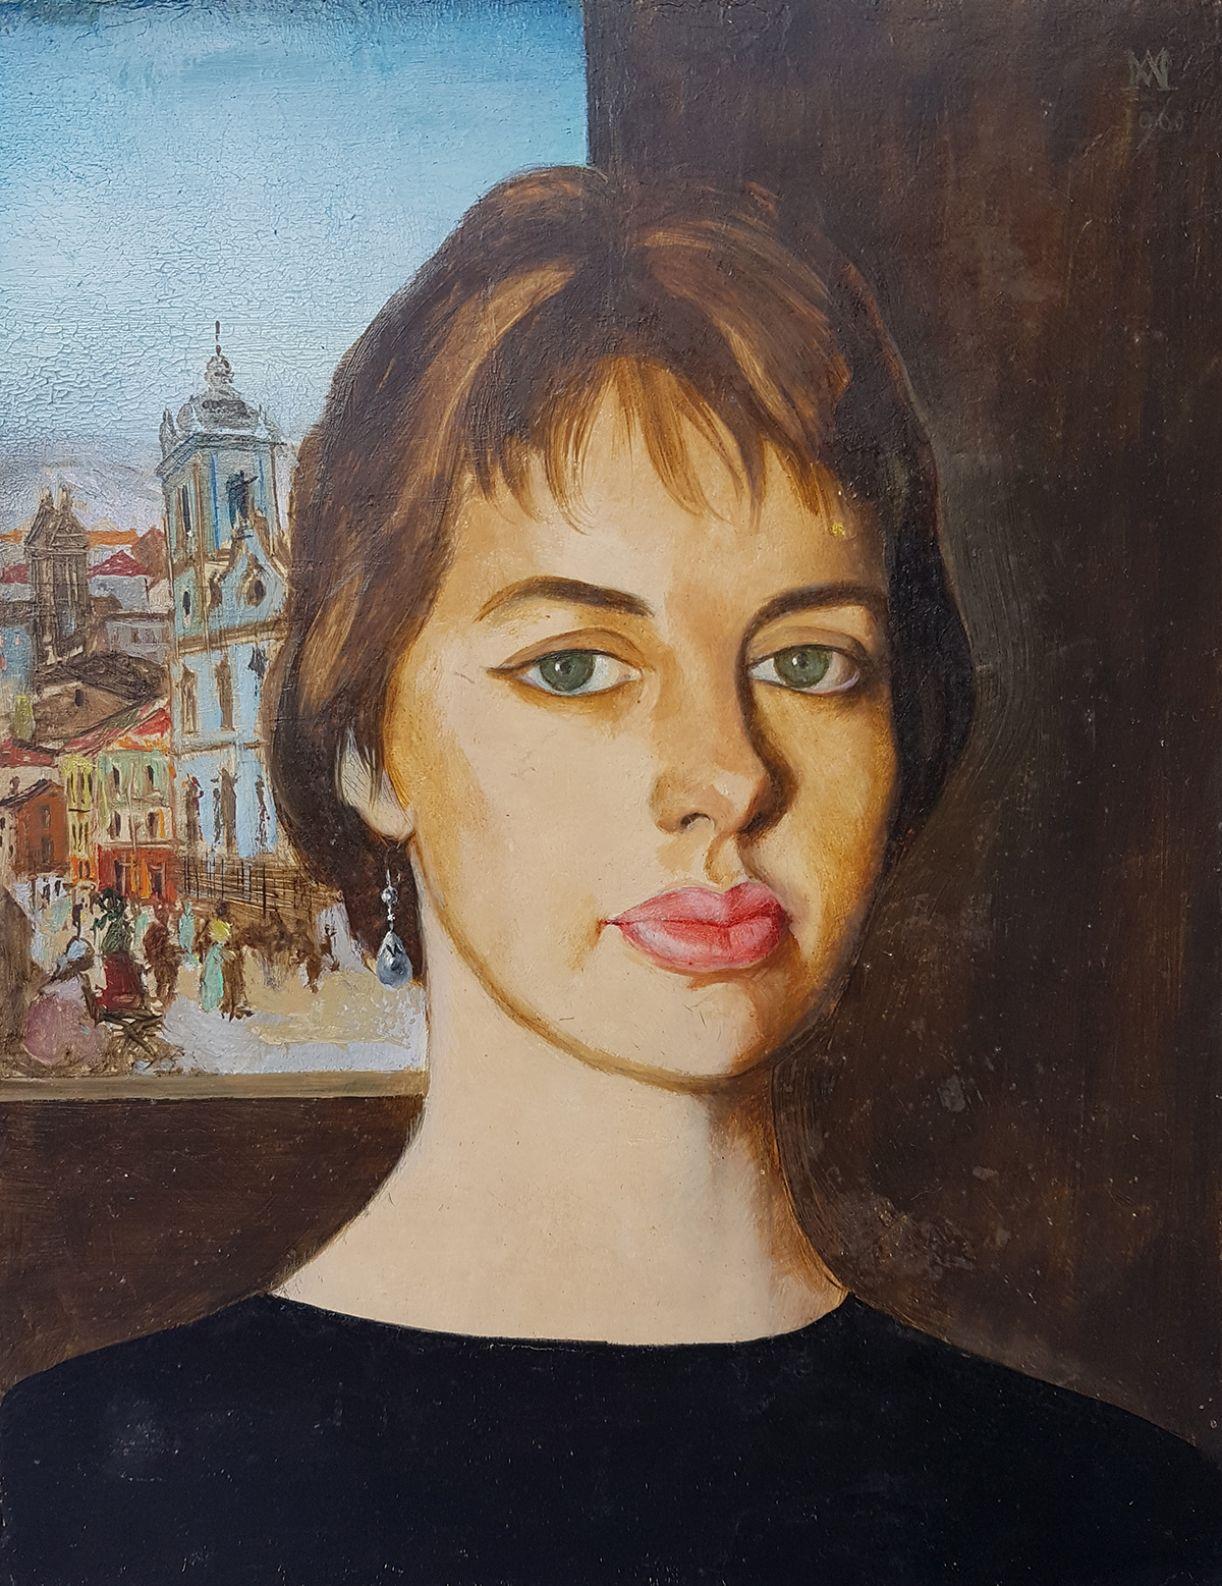 D. Nancy retratada por Mario Agostinelli